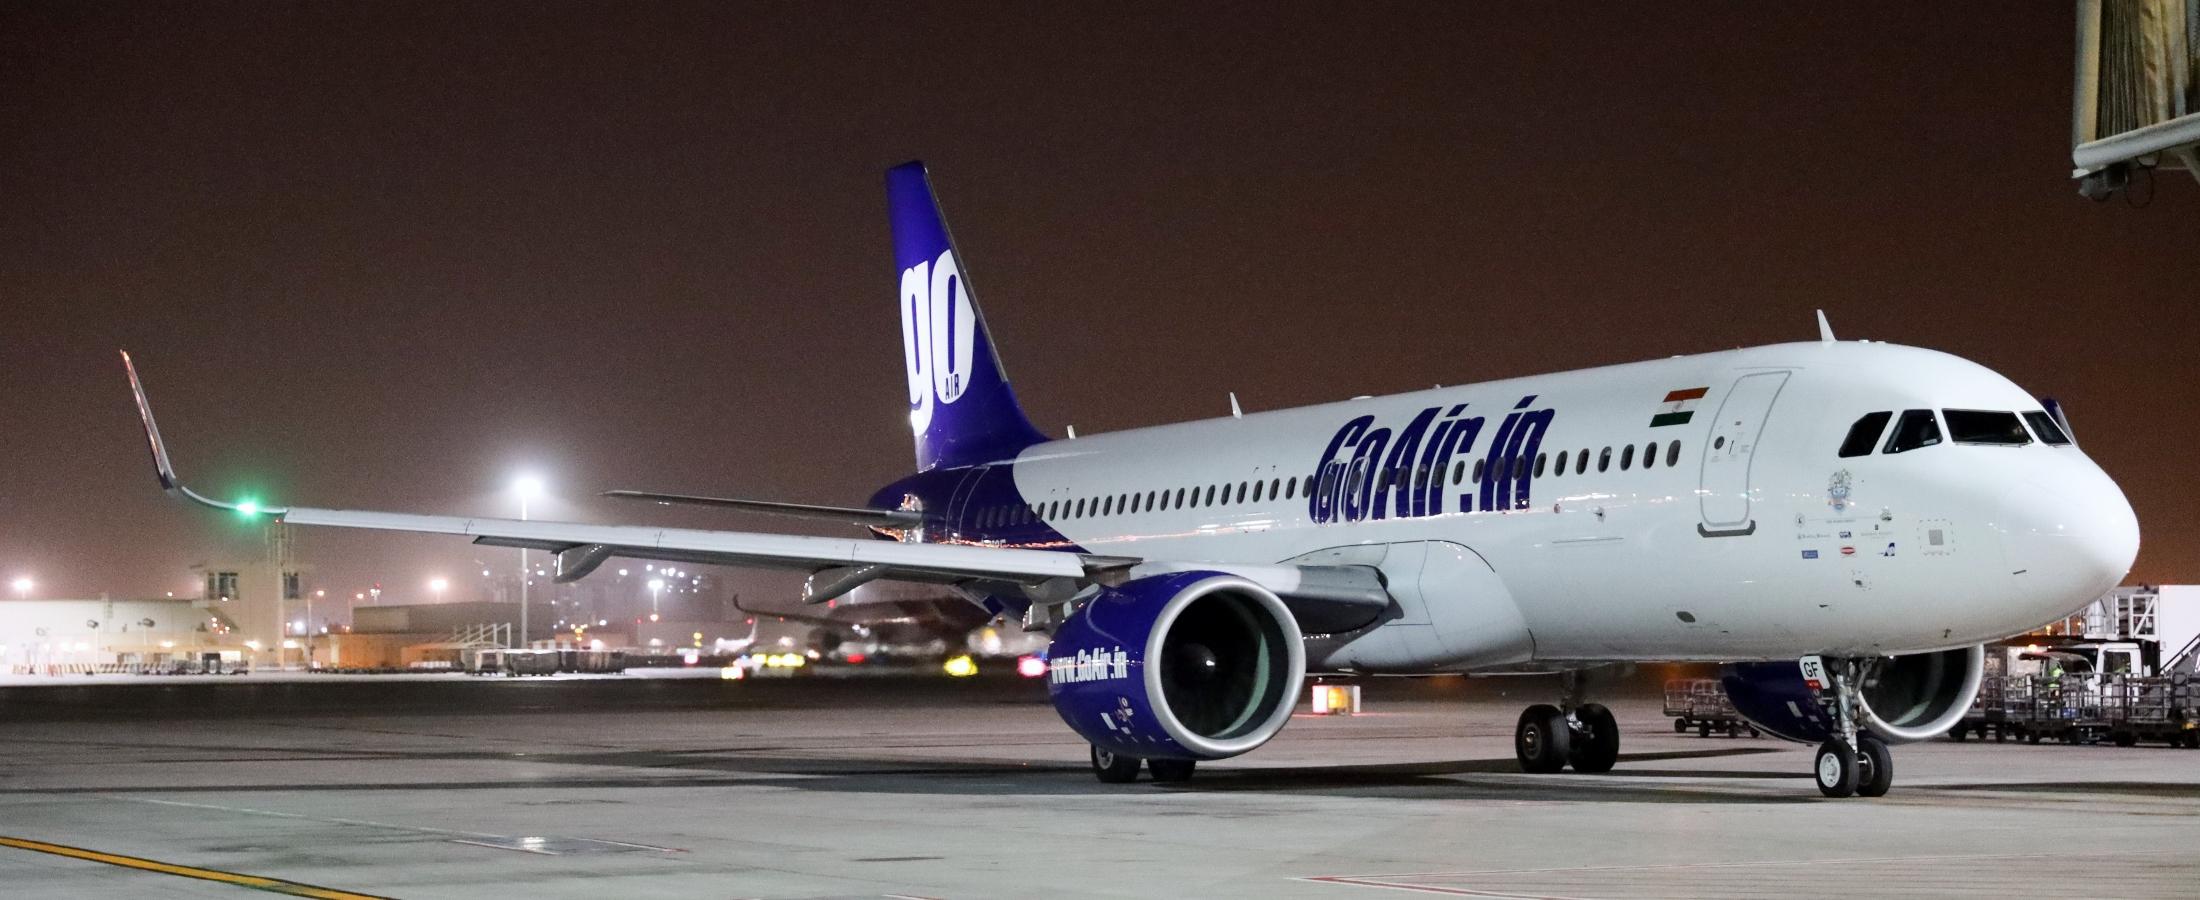 DXB Welcomes GoAir Inaugural Flight from Kannur